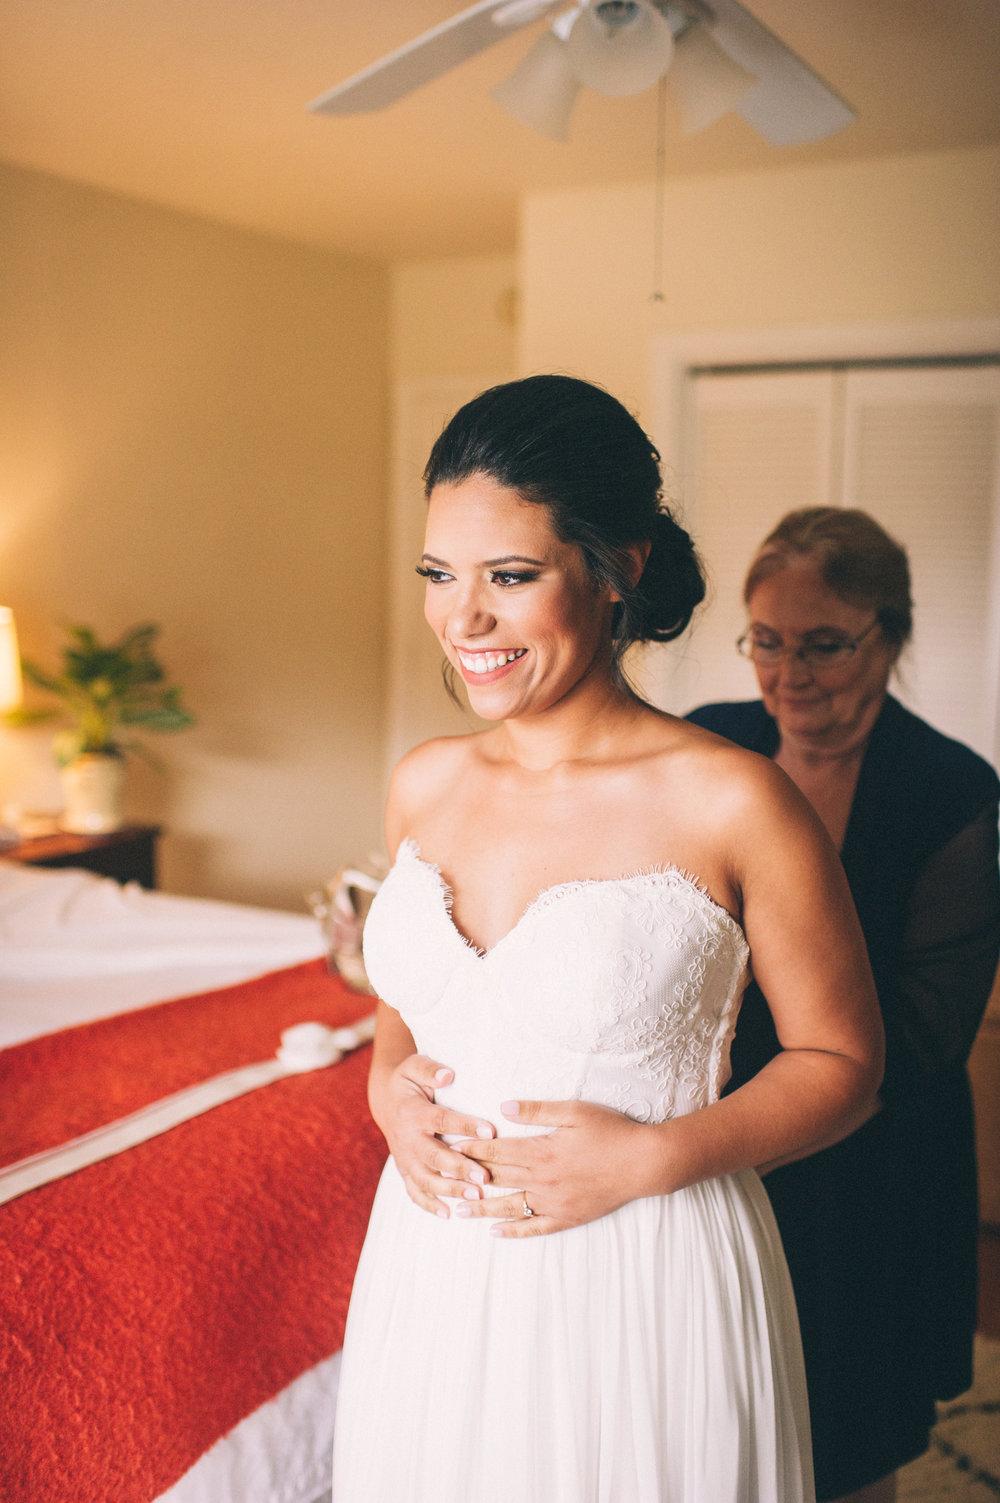 Micaha & Austin // Cozy Autumn Wedding at Springhouse Gardens // Lexington, Kentucky // Wedding Photography // Getting Into Dress